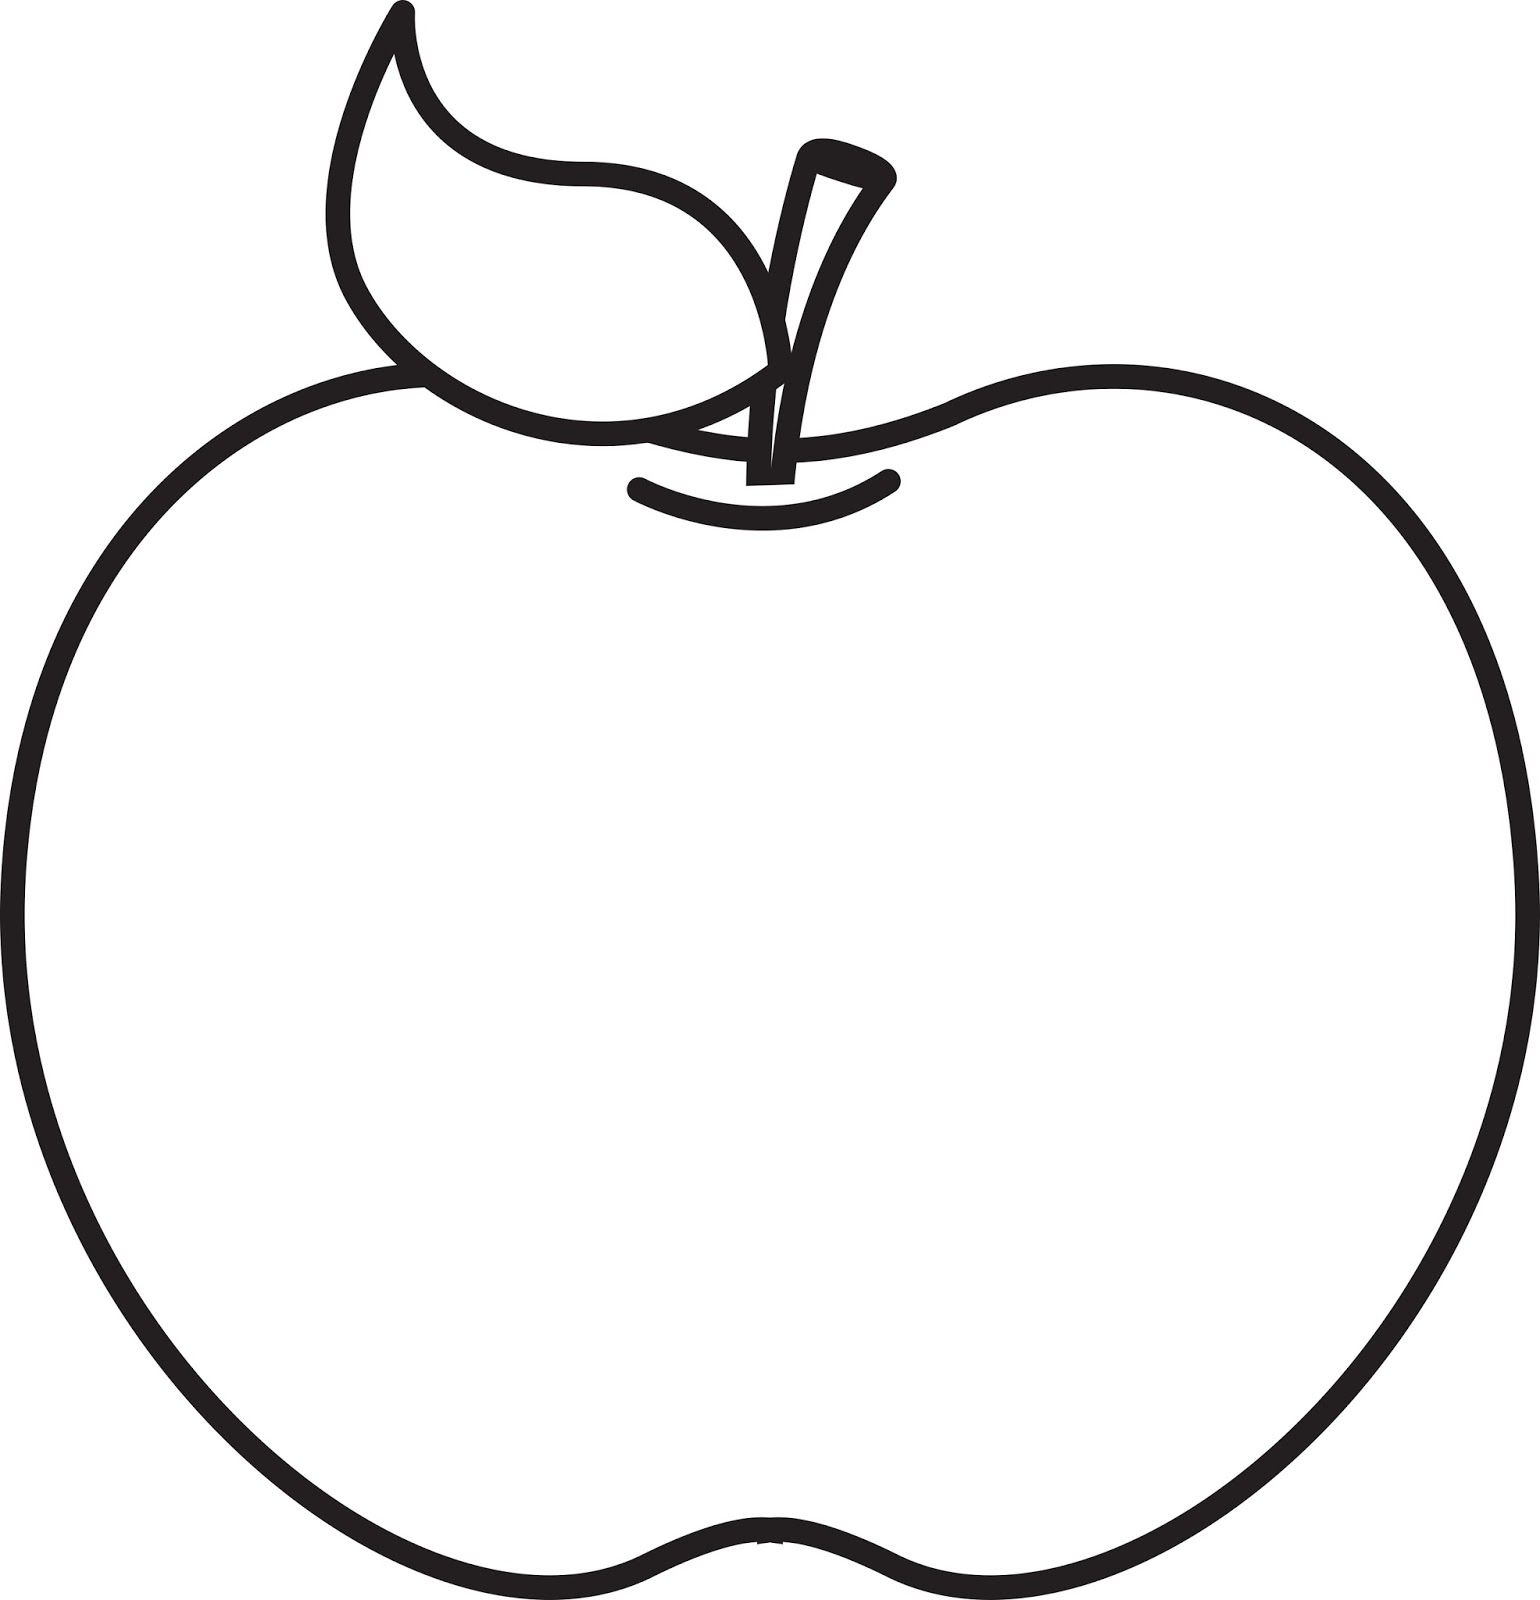 Image result for apple. White clipart